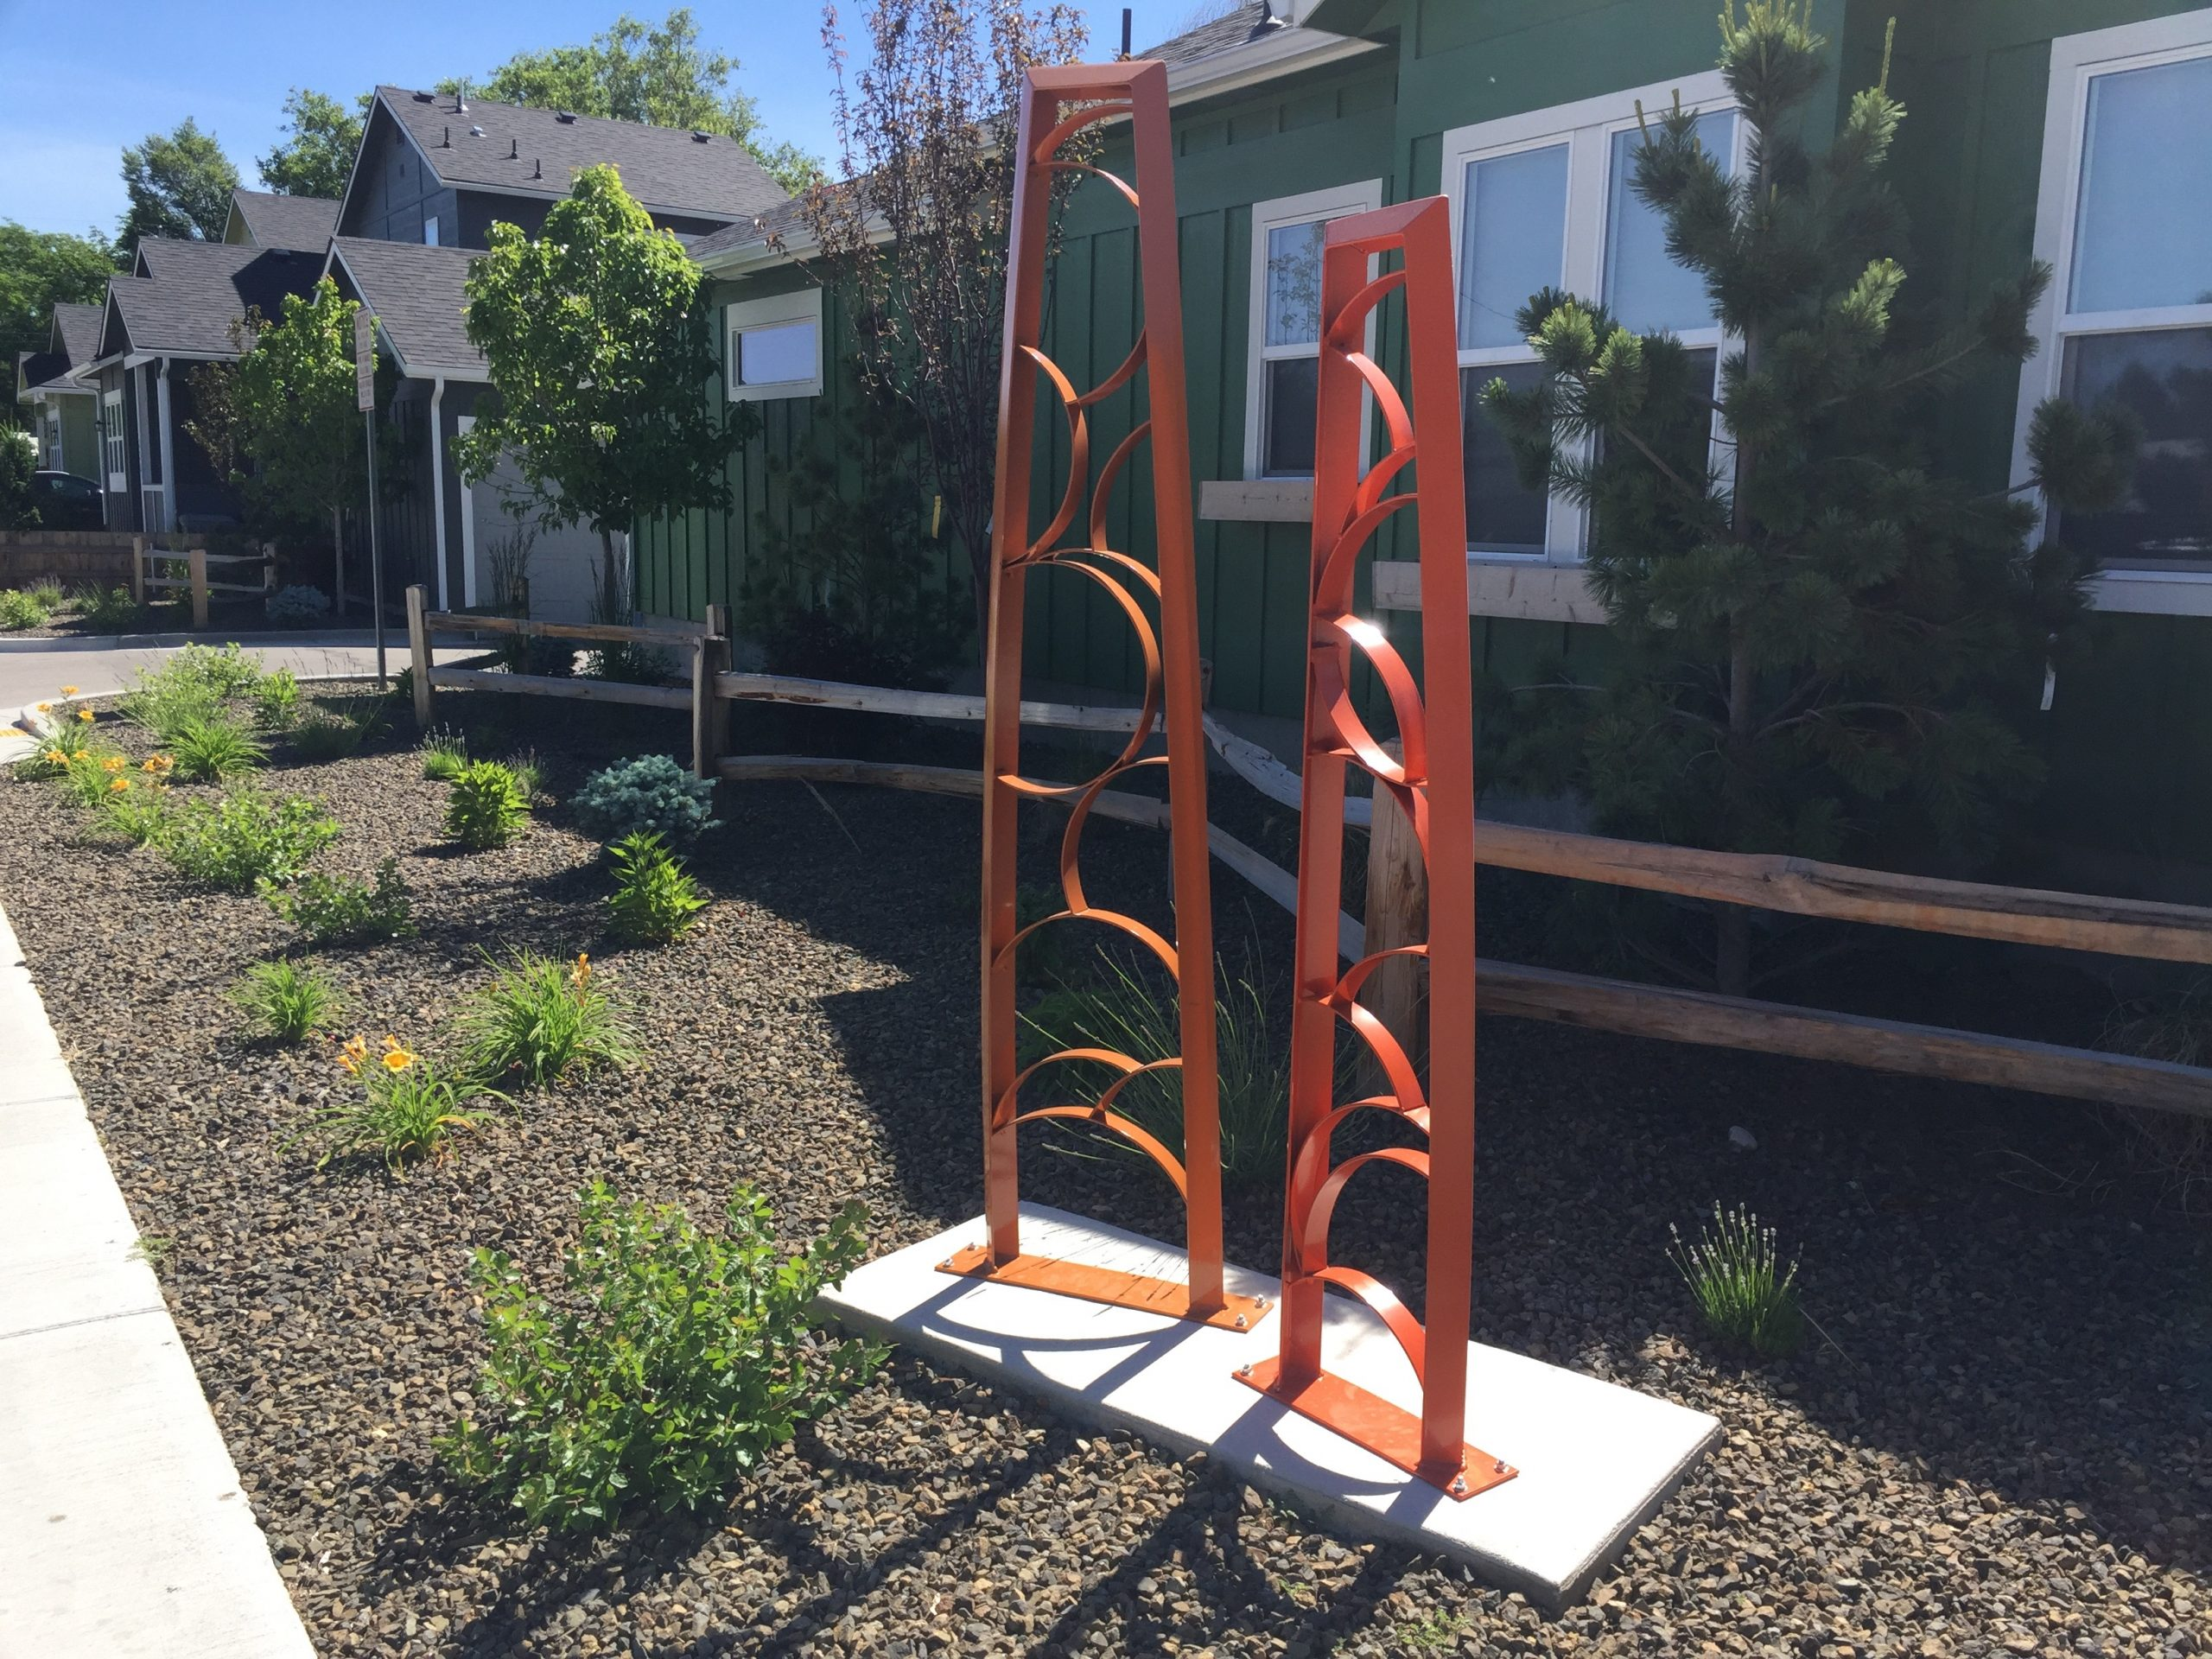 NeighborWorks Boise: 40th Street